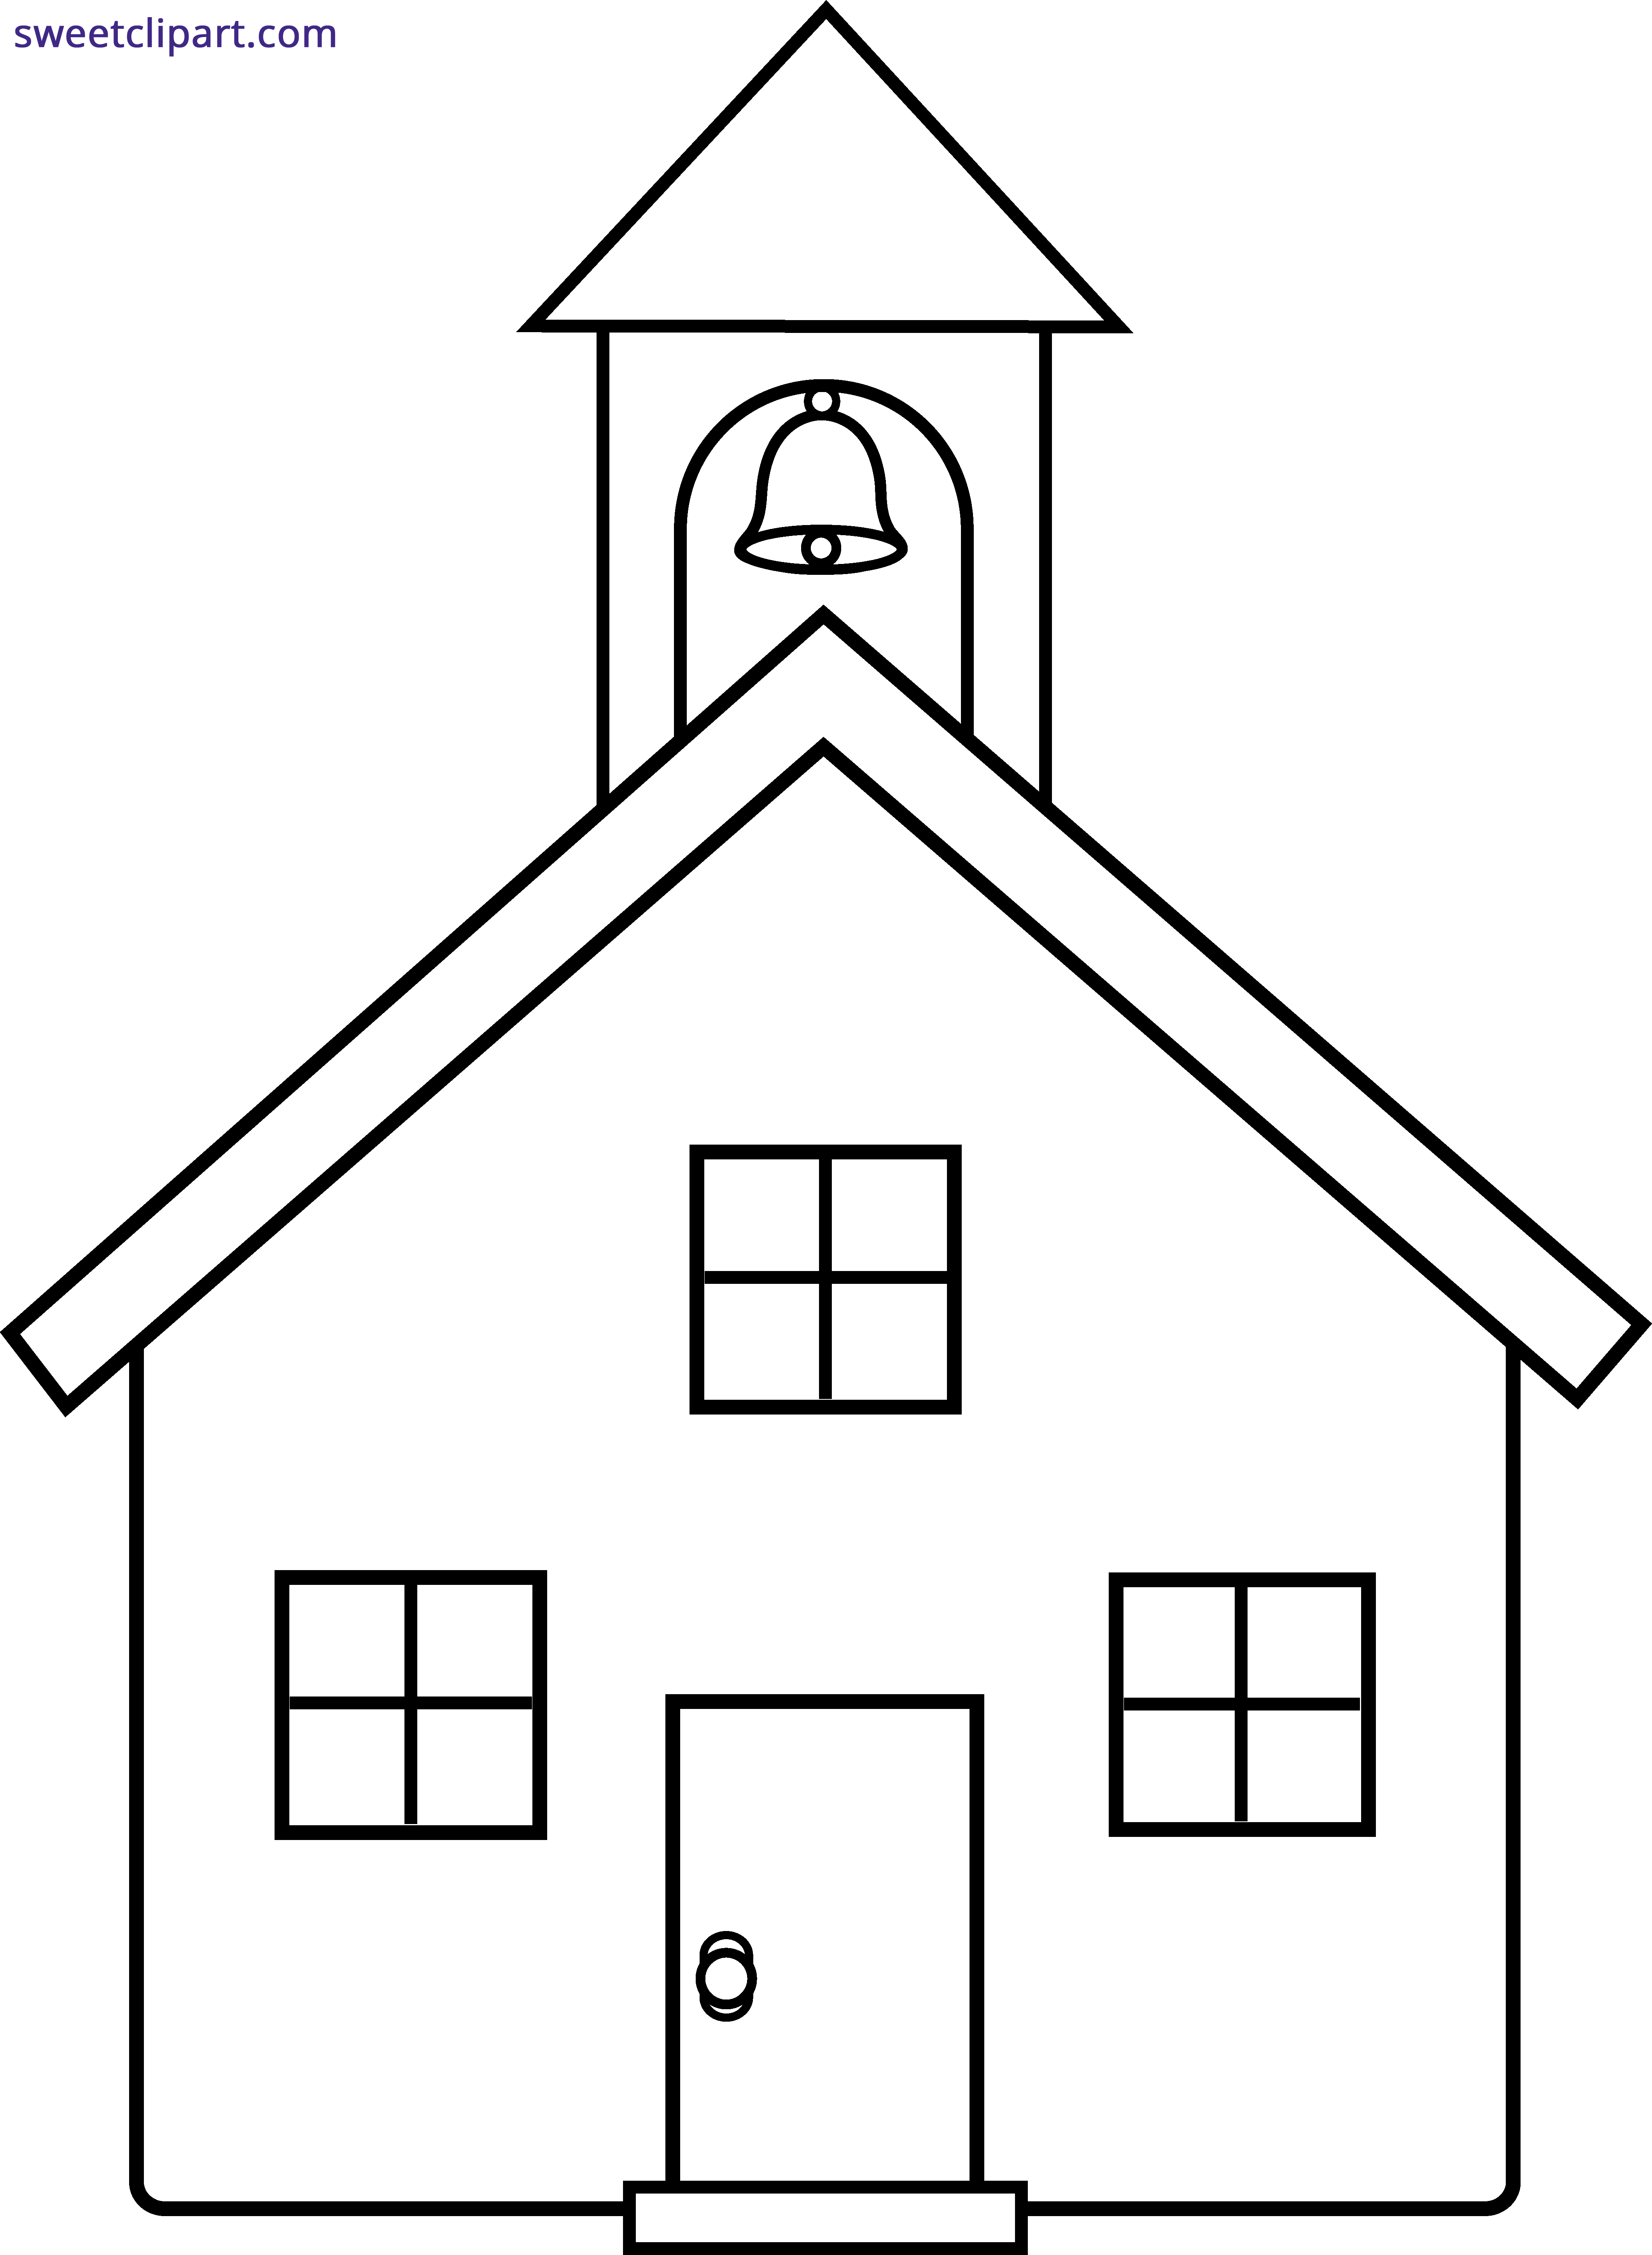 School house line art. Schoolhouse clipart schhol